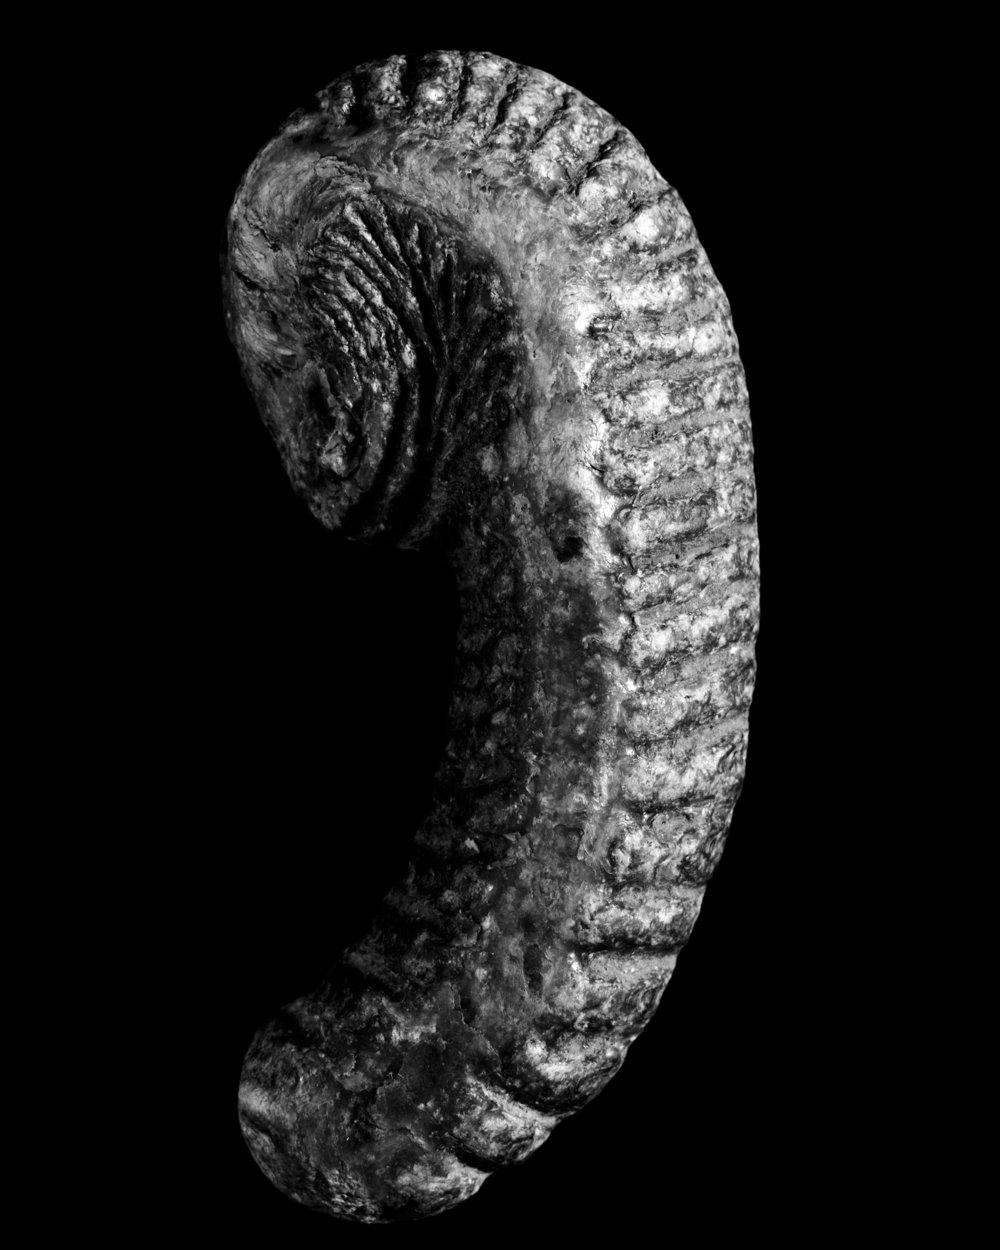 11_Paleontological Museum Zurich_4x5.jpg